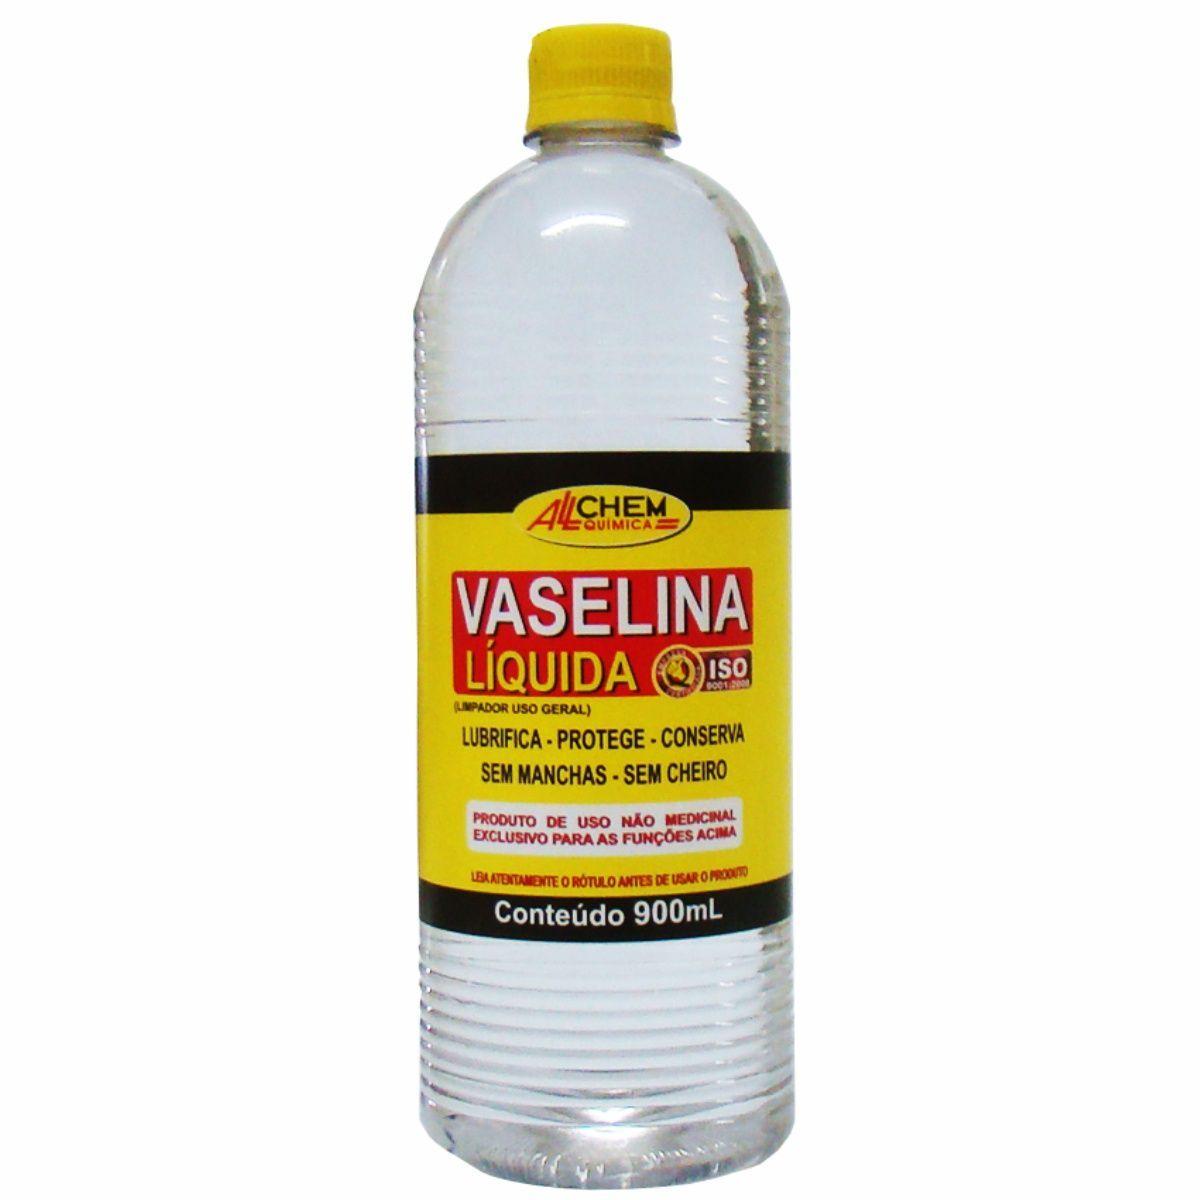 vaselina-liquida-allchem